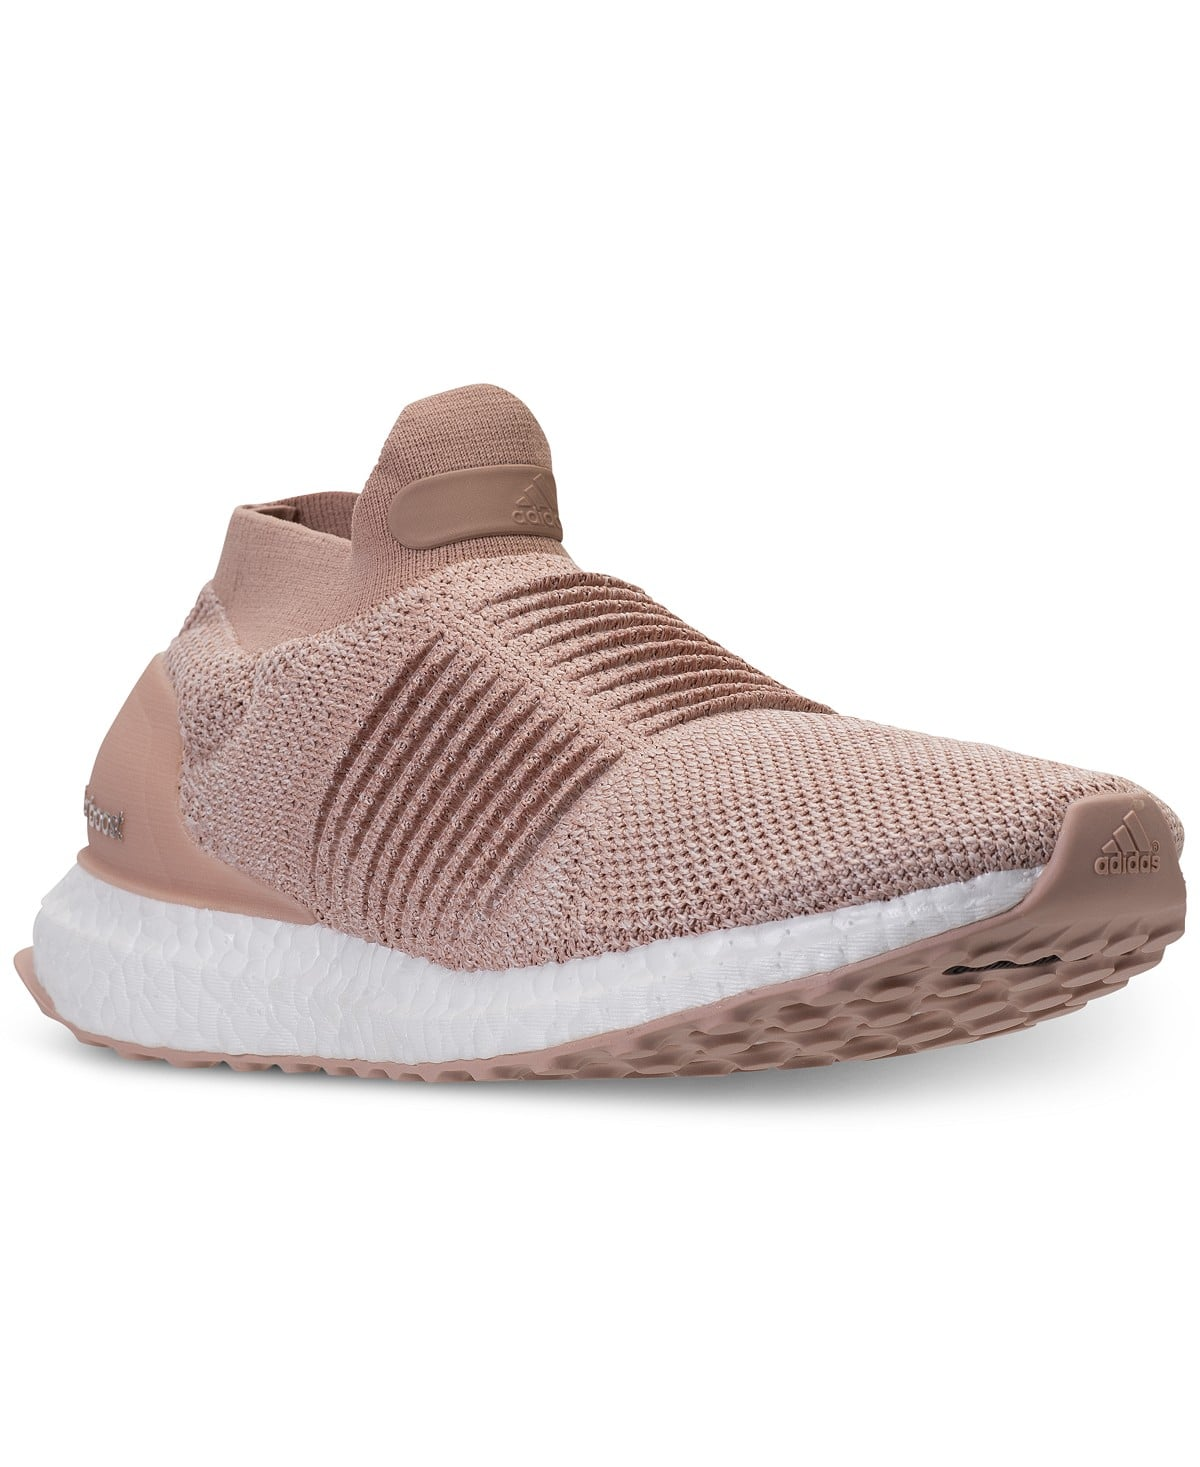 Adidas UltraBOOST Laceless Running